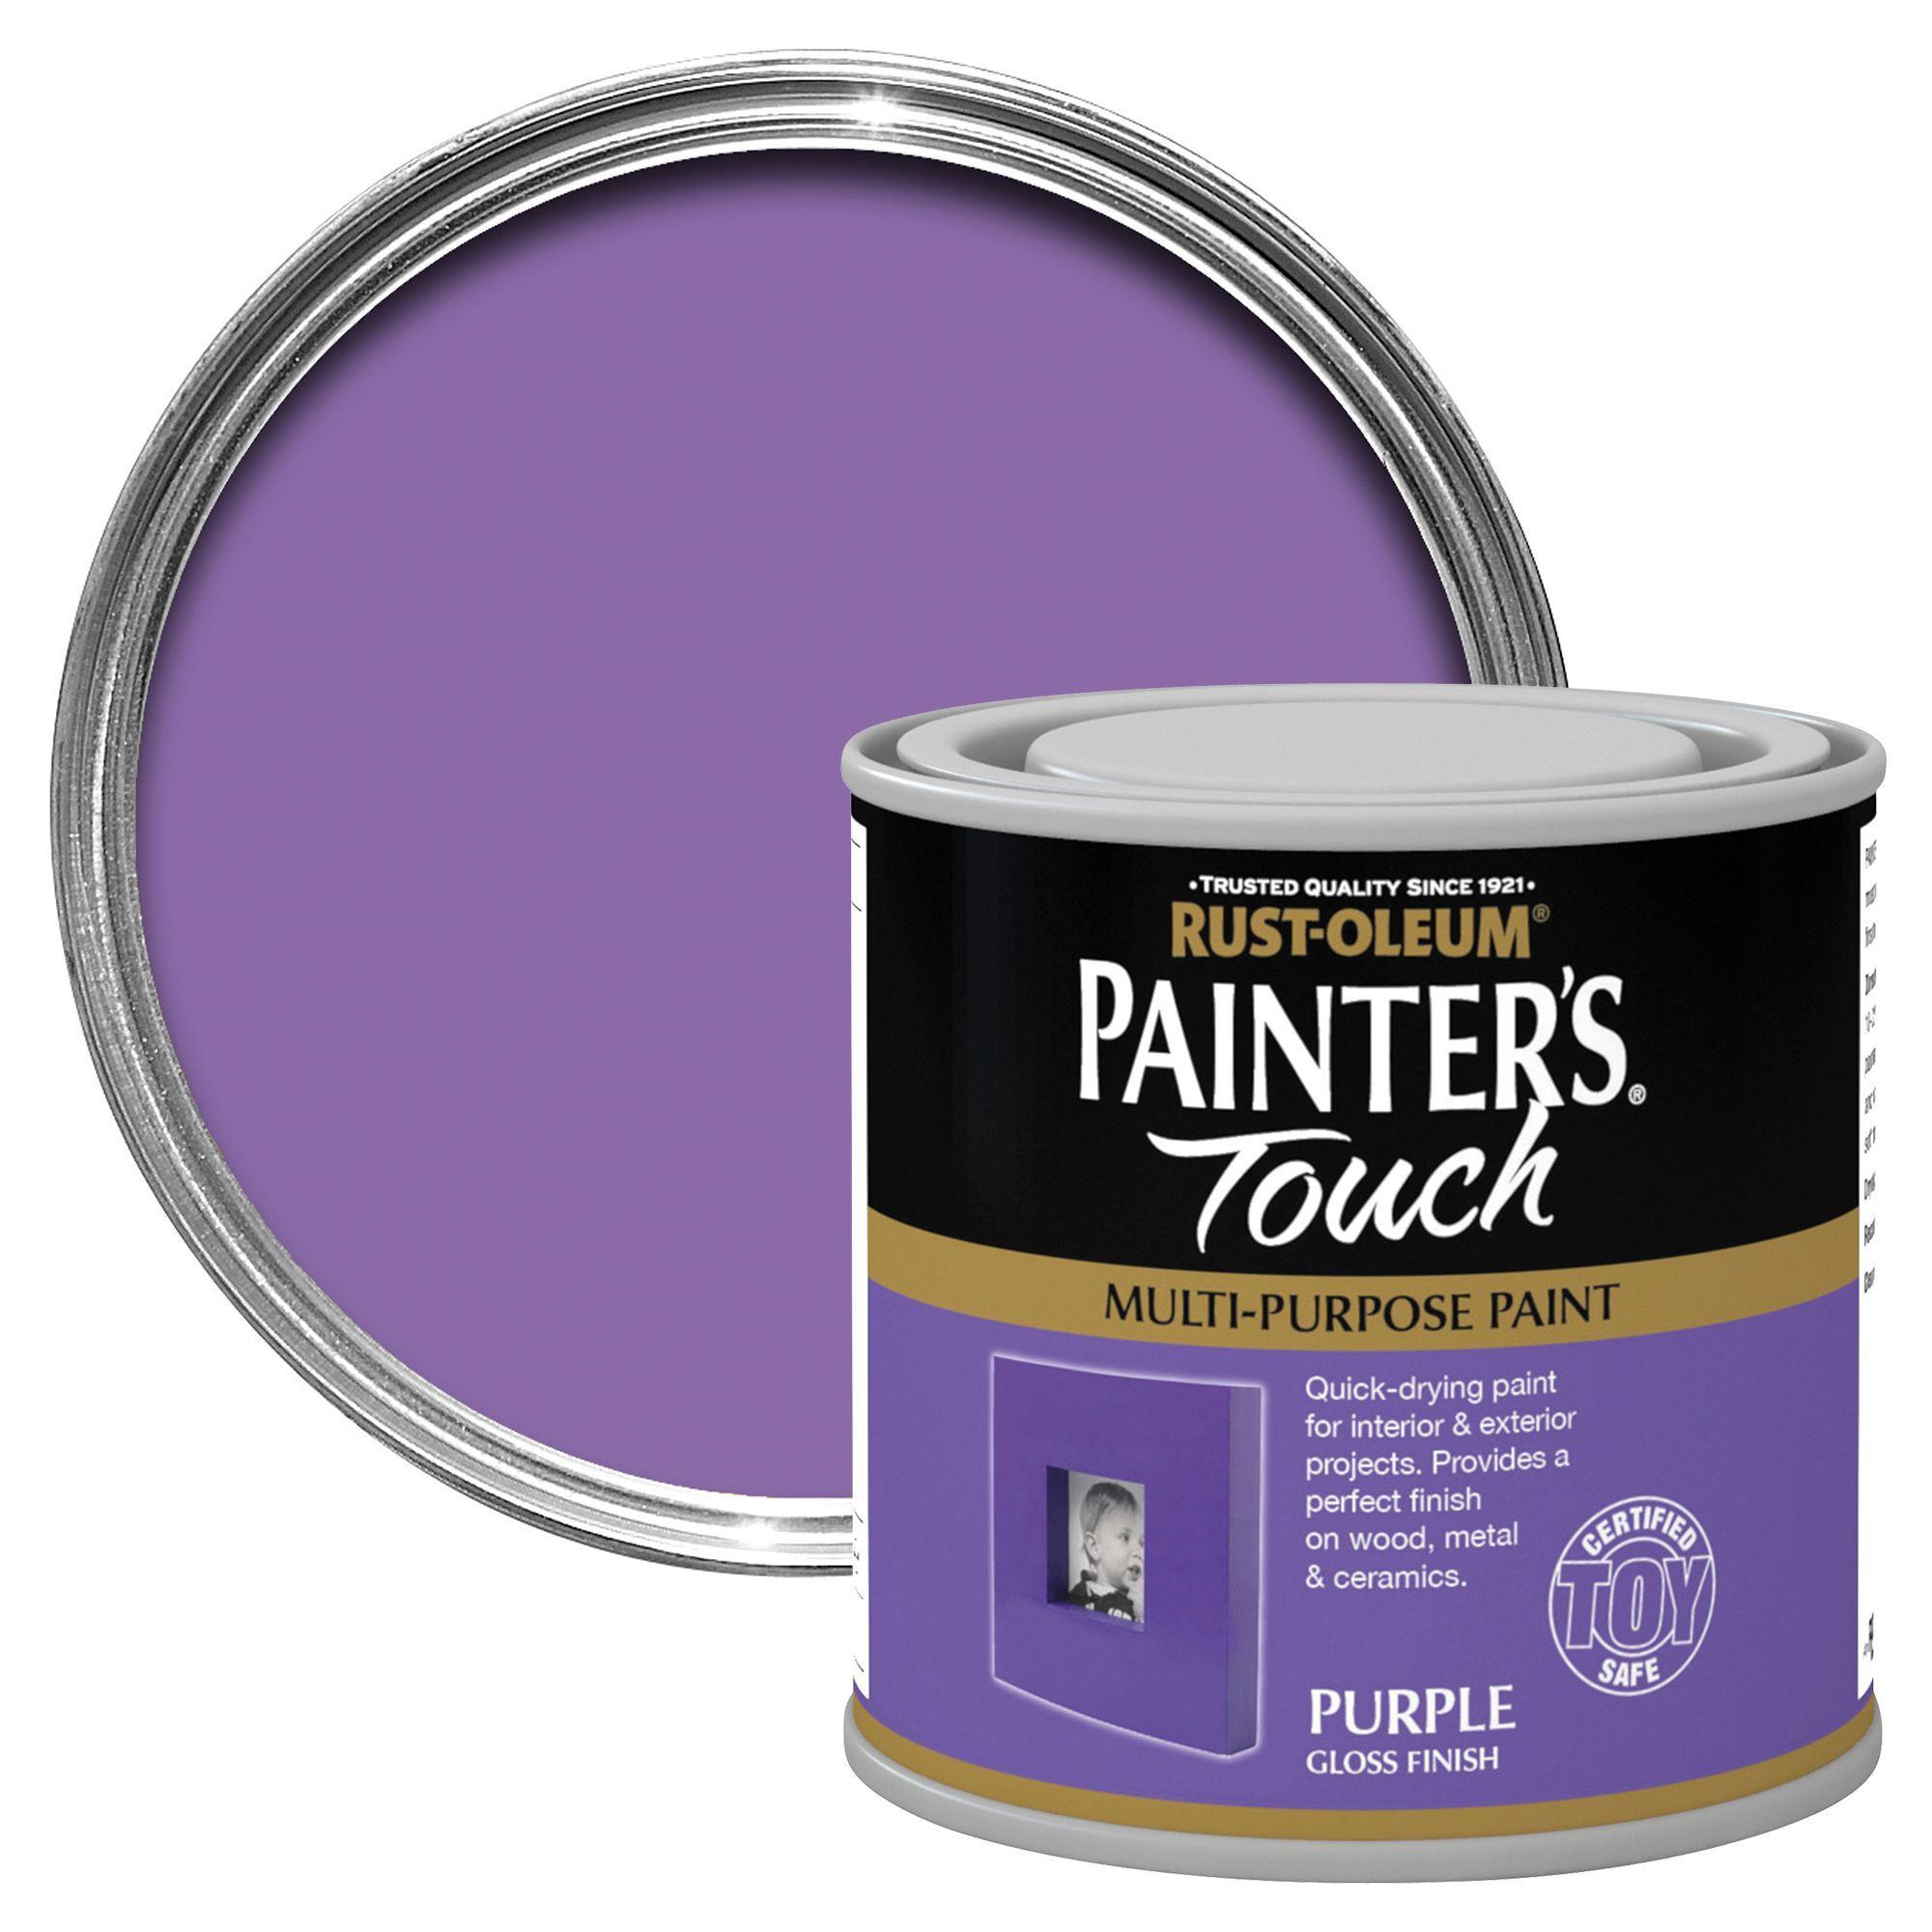 Rust-oleum Painter's Touch Interior & Exterior Purple Gloss Multipurpose Paint 250ml